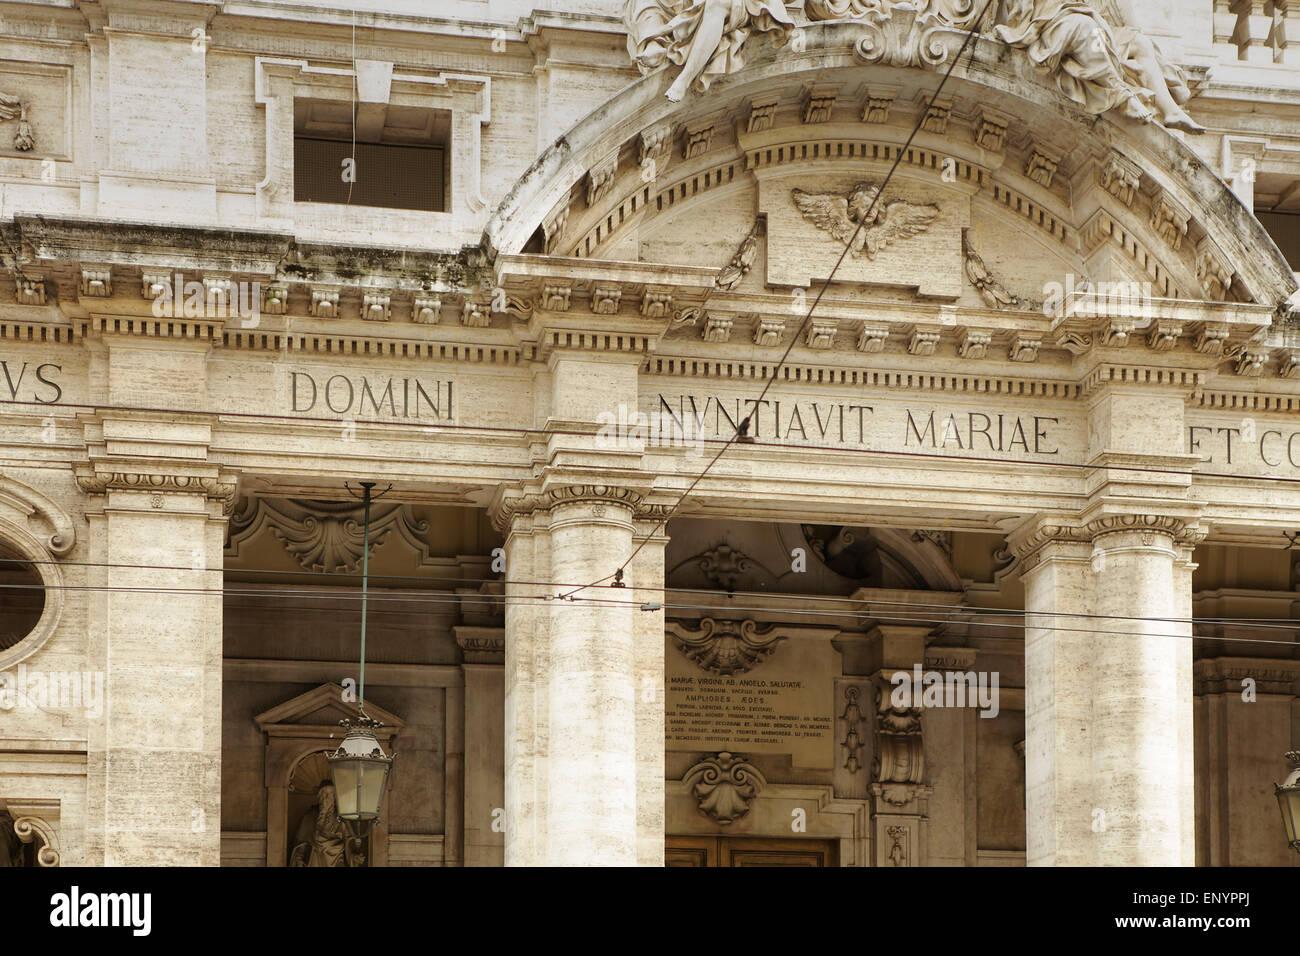 Ornate building in Turin, Italy Stock Photo